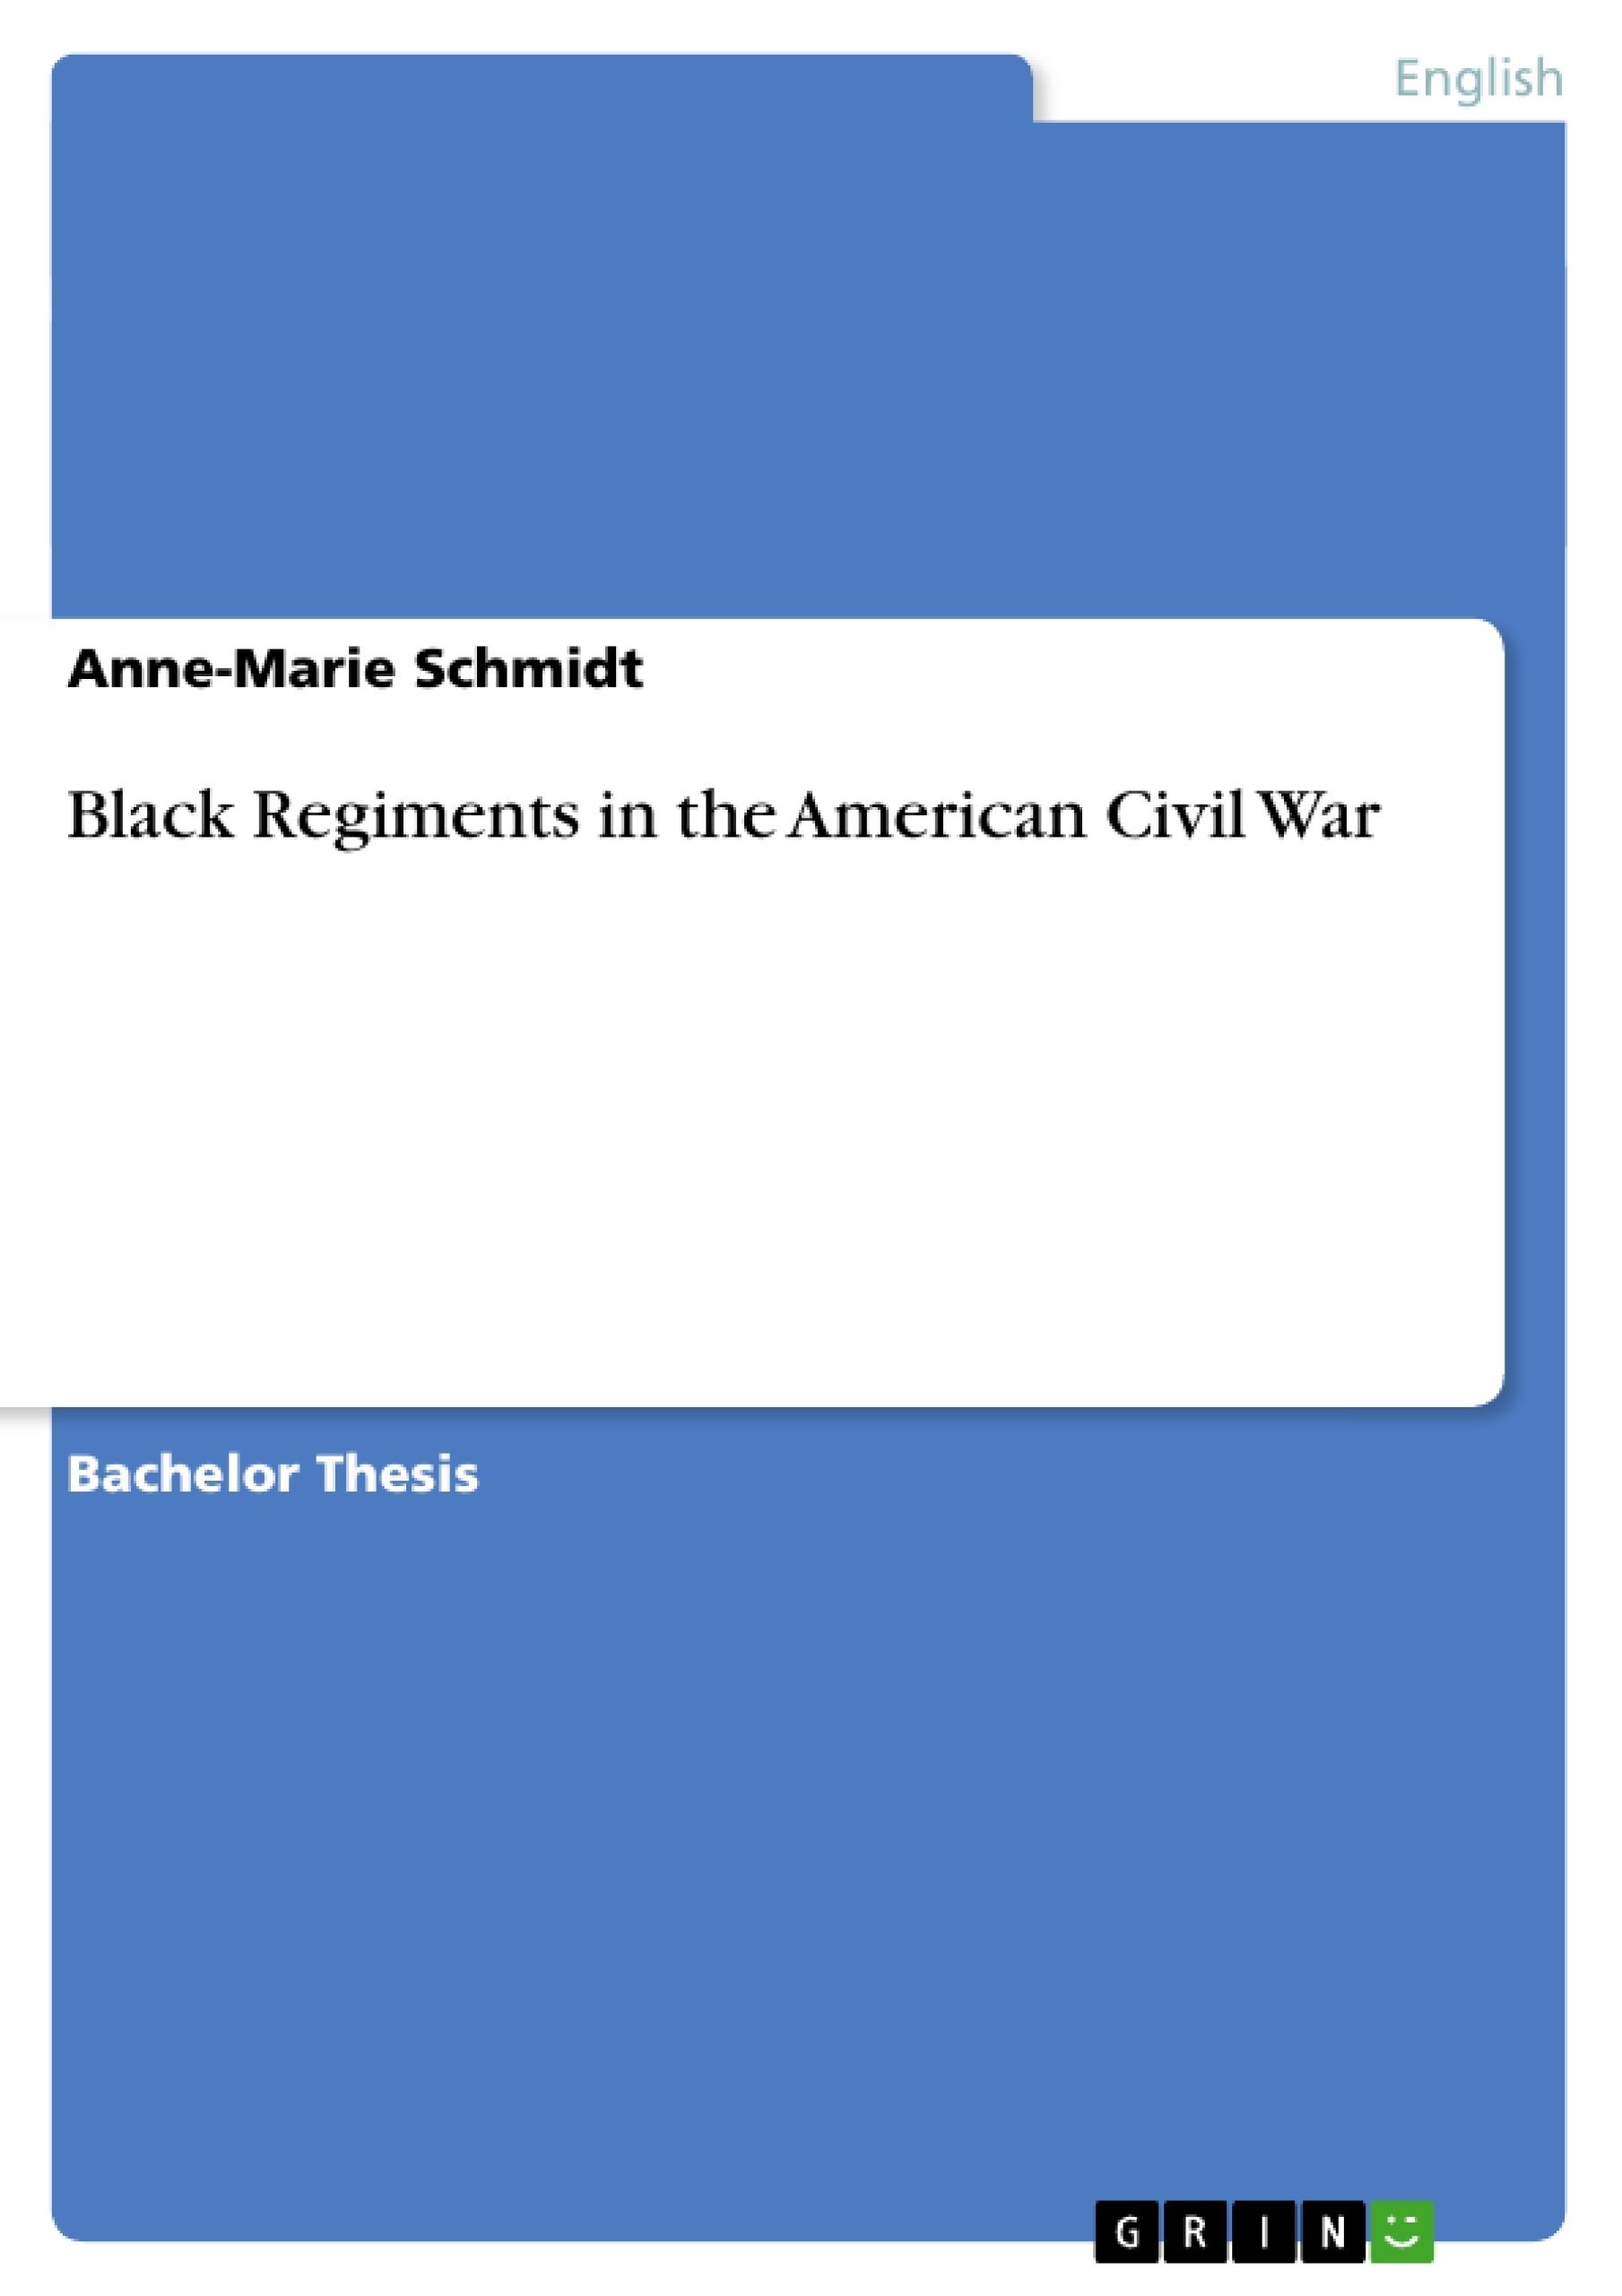 Title: Black Regiments in the American Civil War